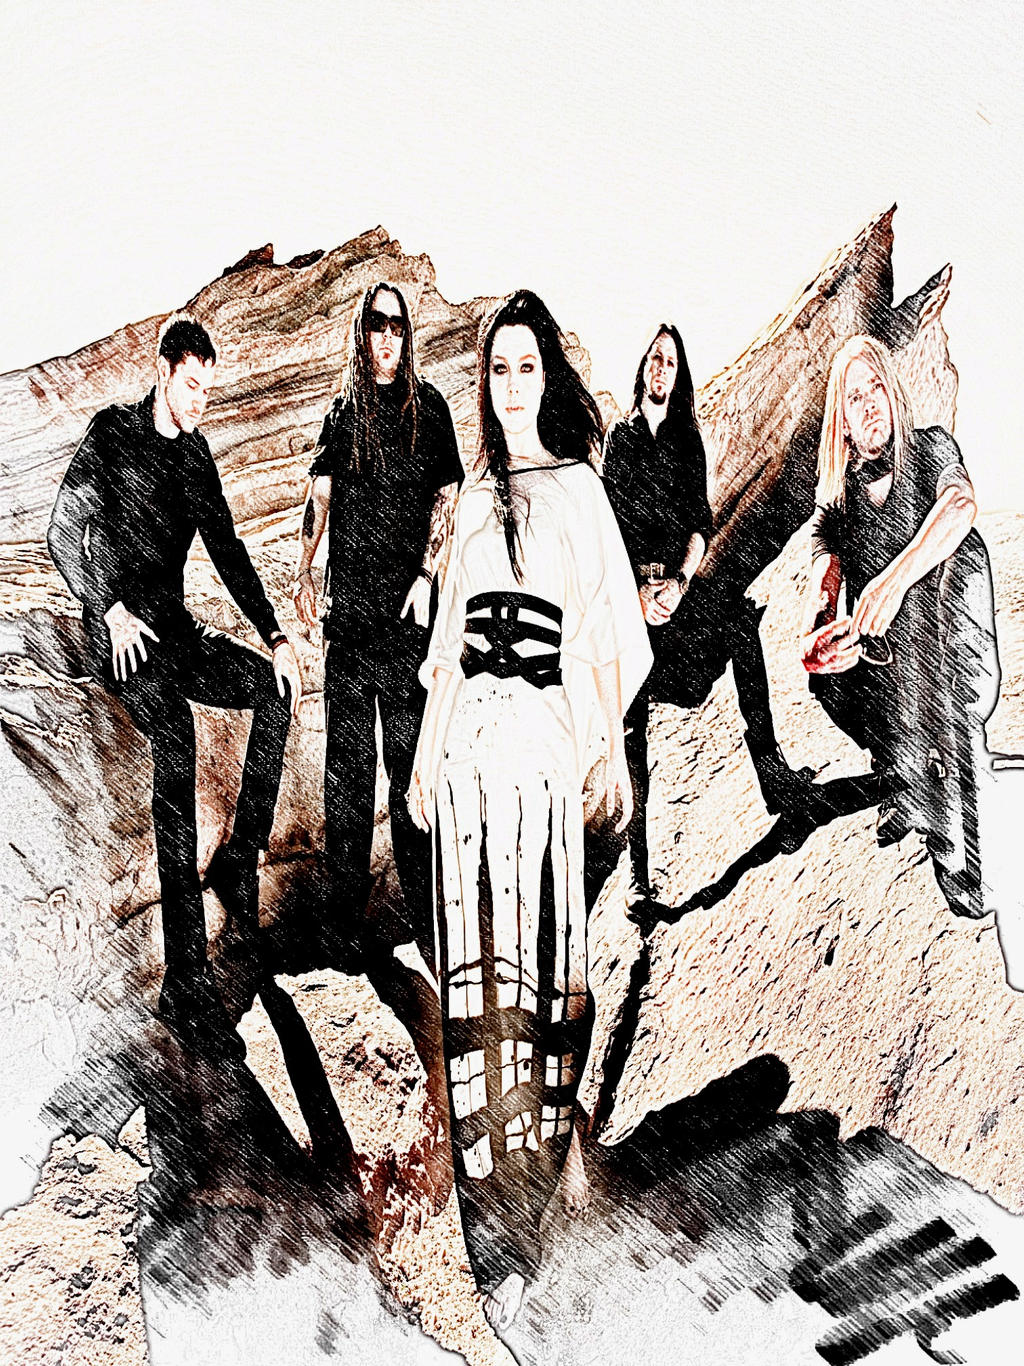 Evanescence album photo by Hernandez-HensonEvanescence Album Cover 2013